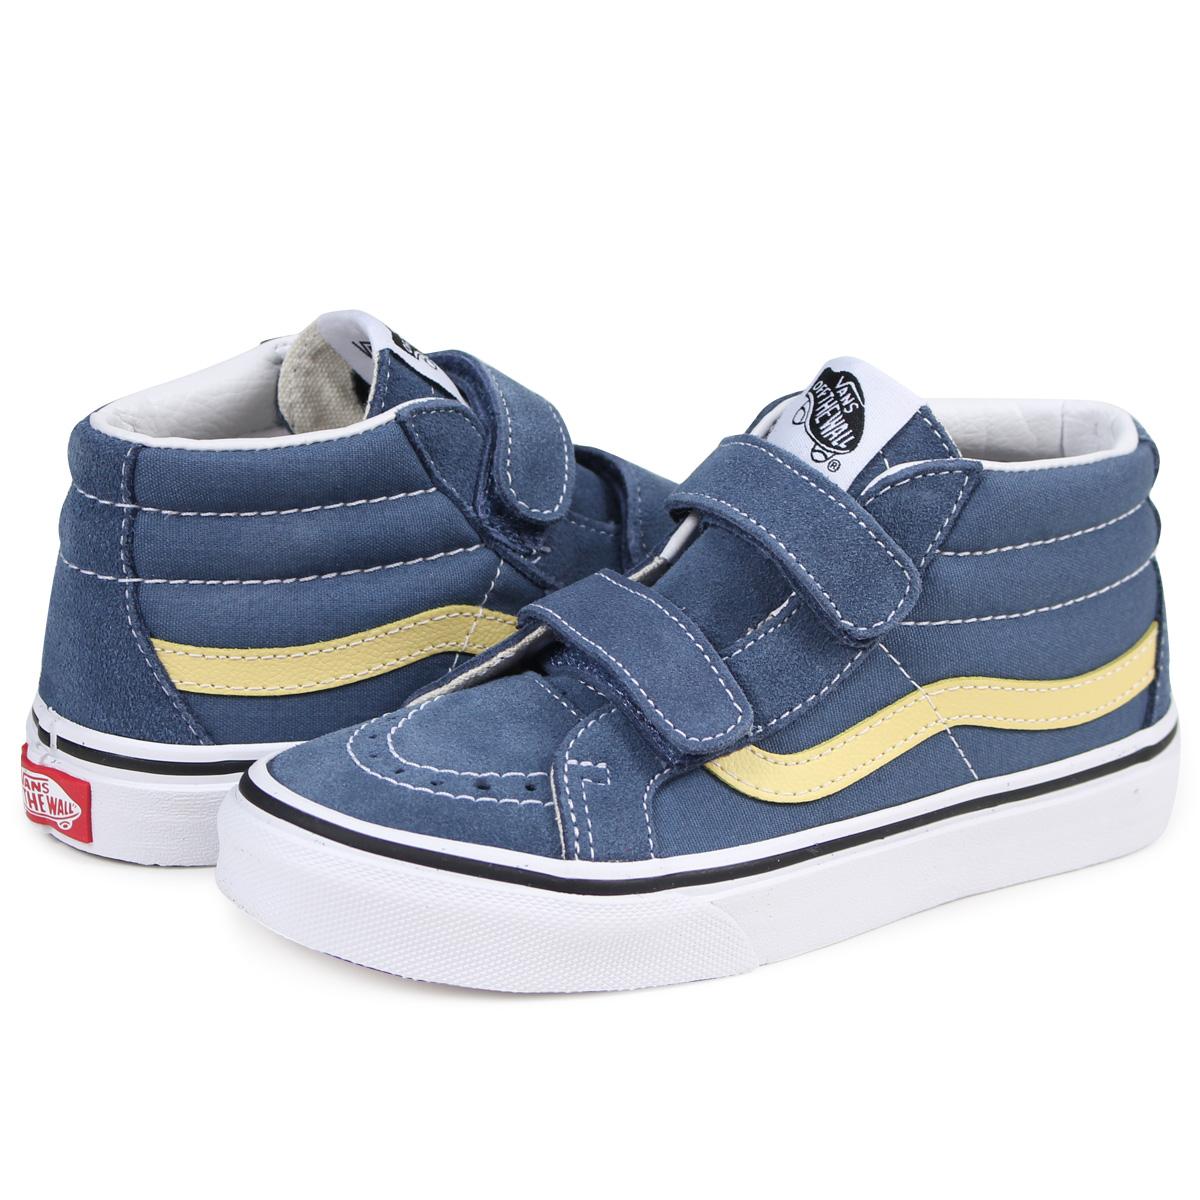 958e48f183 VANS SK8-MID KIDS REISSUE VELCRO sneakers kids vans station wagons  VN0A346YQ8D gray  2 16 Shinnyu load   182